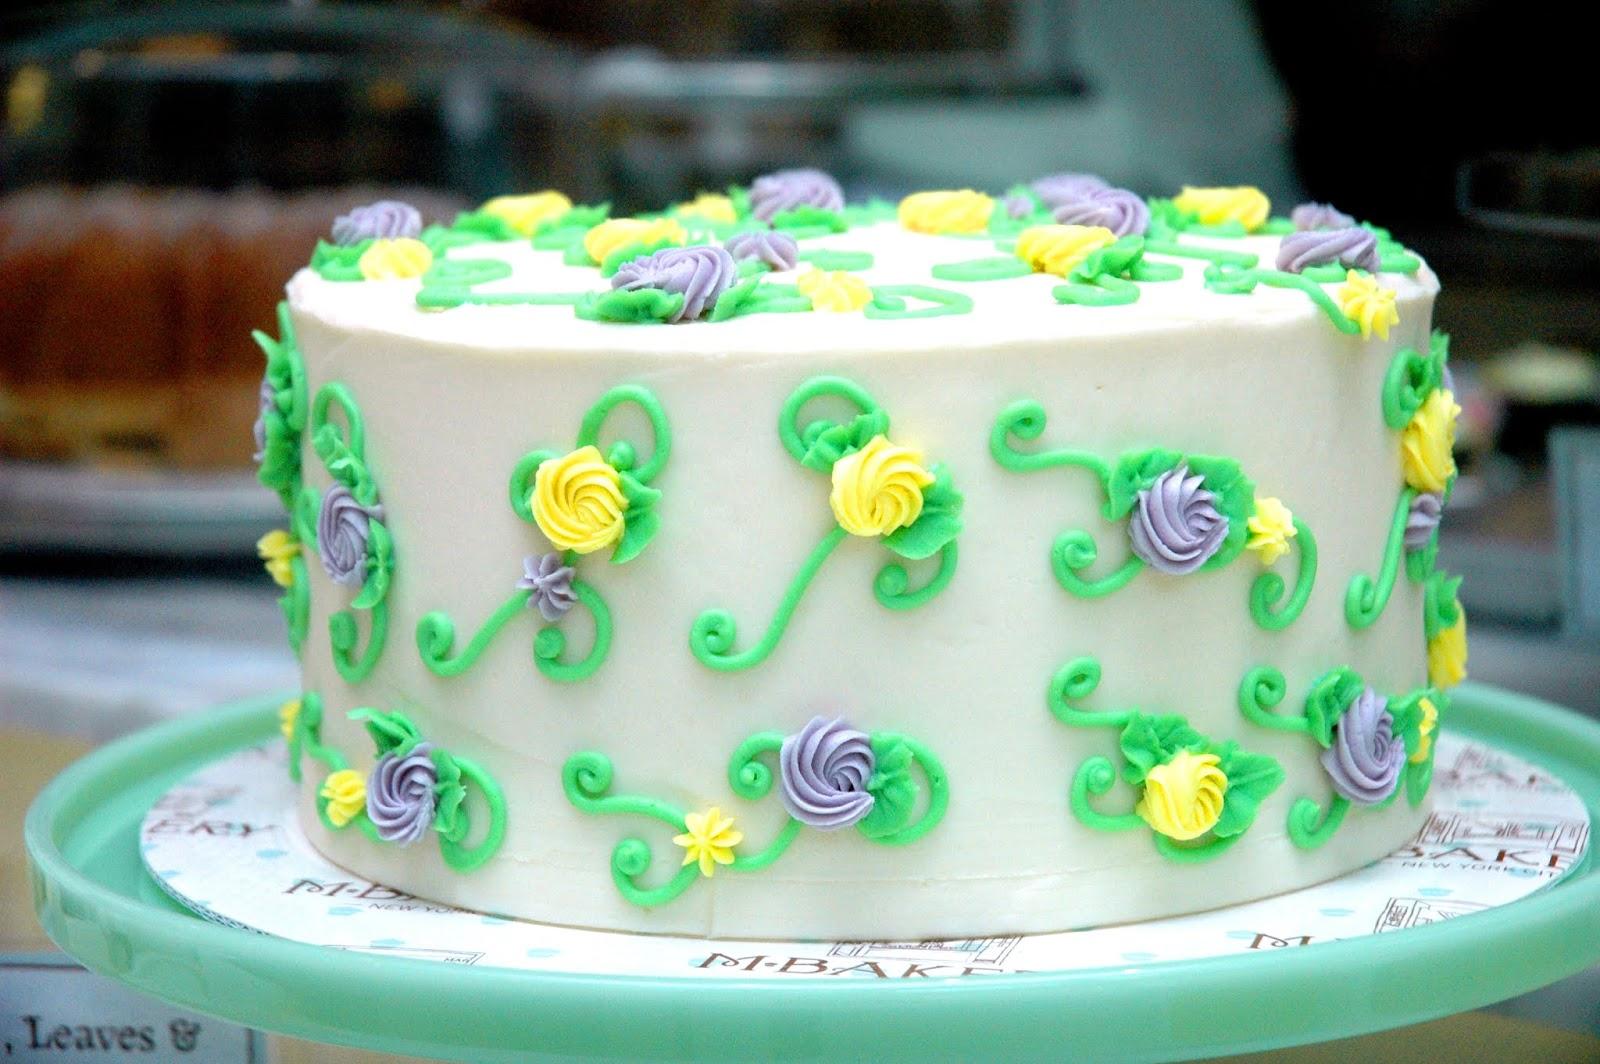 Hummingbird Bakery Flourless Chocolate Cake